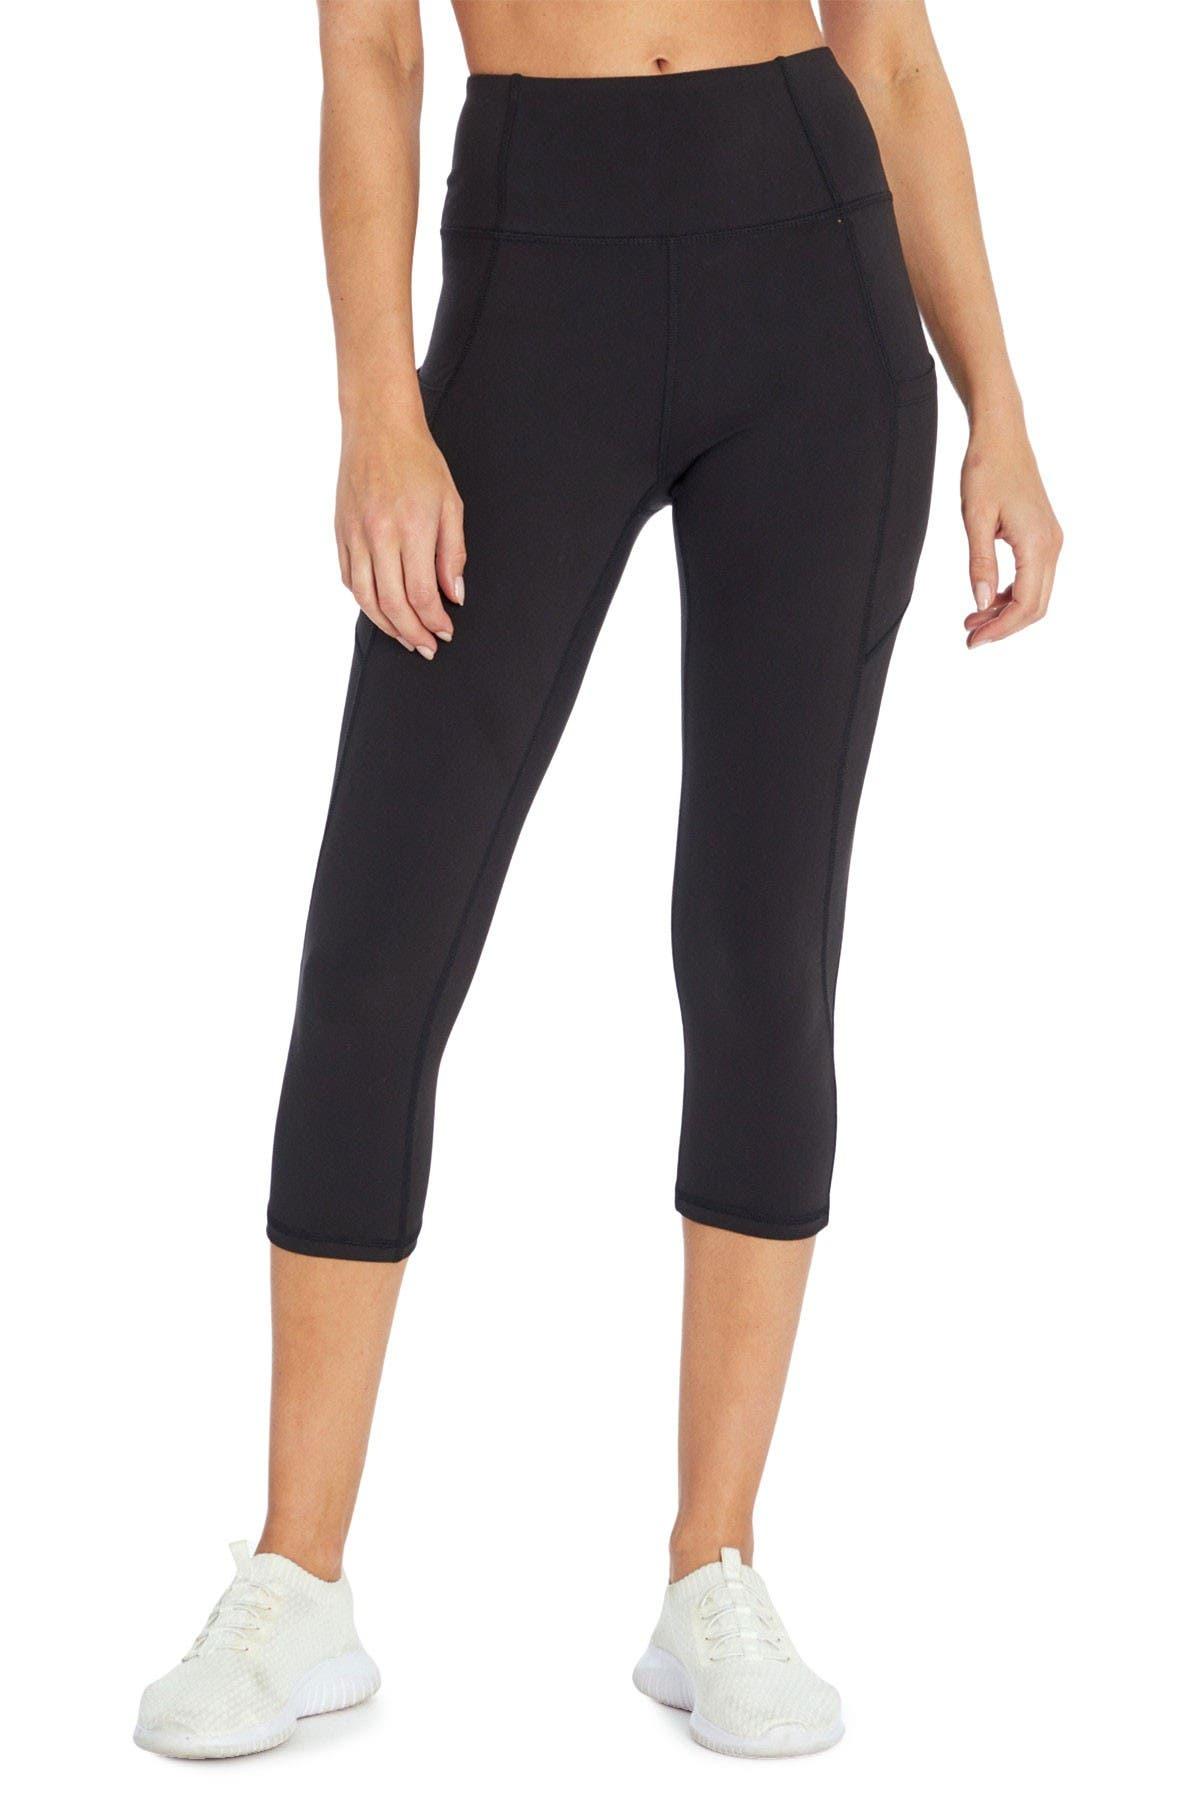 Image of Jessica Simpson High Rise Tummy Control Capri Leggings